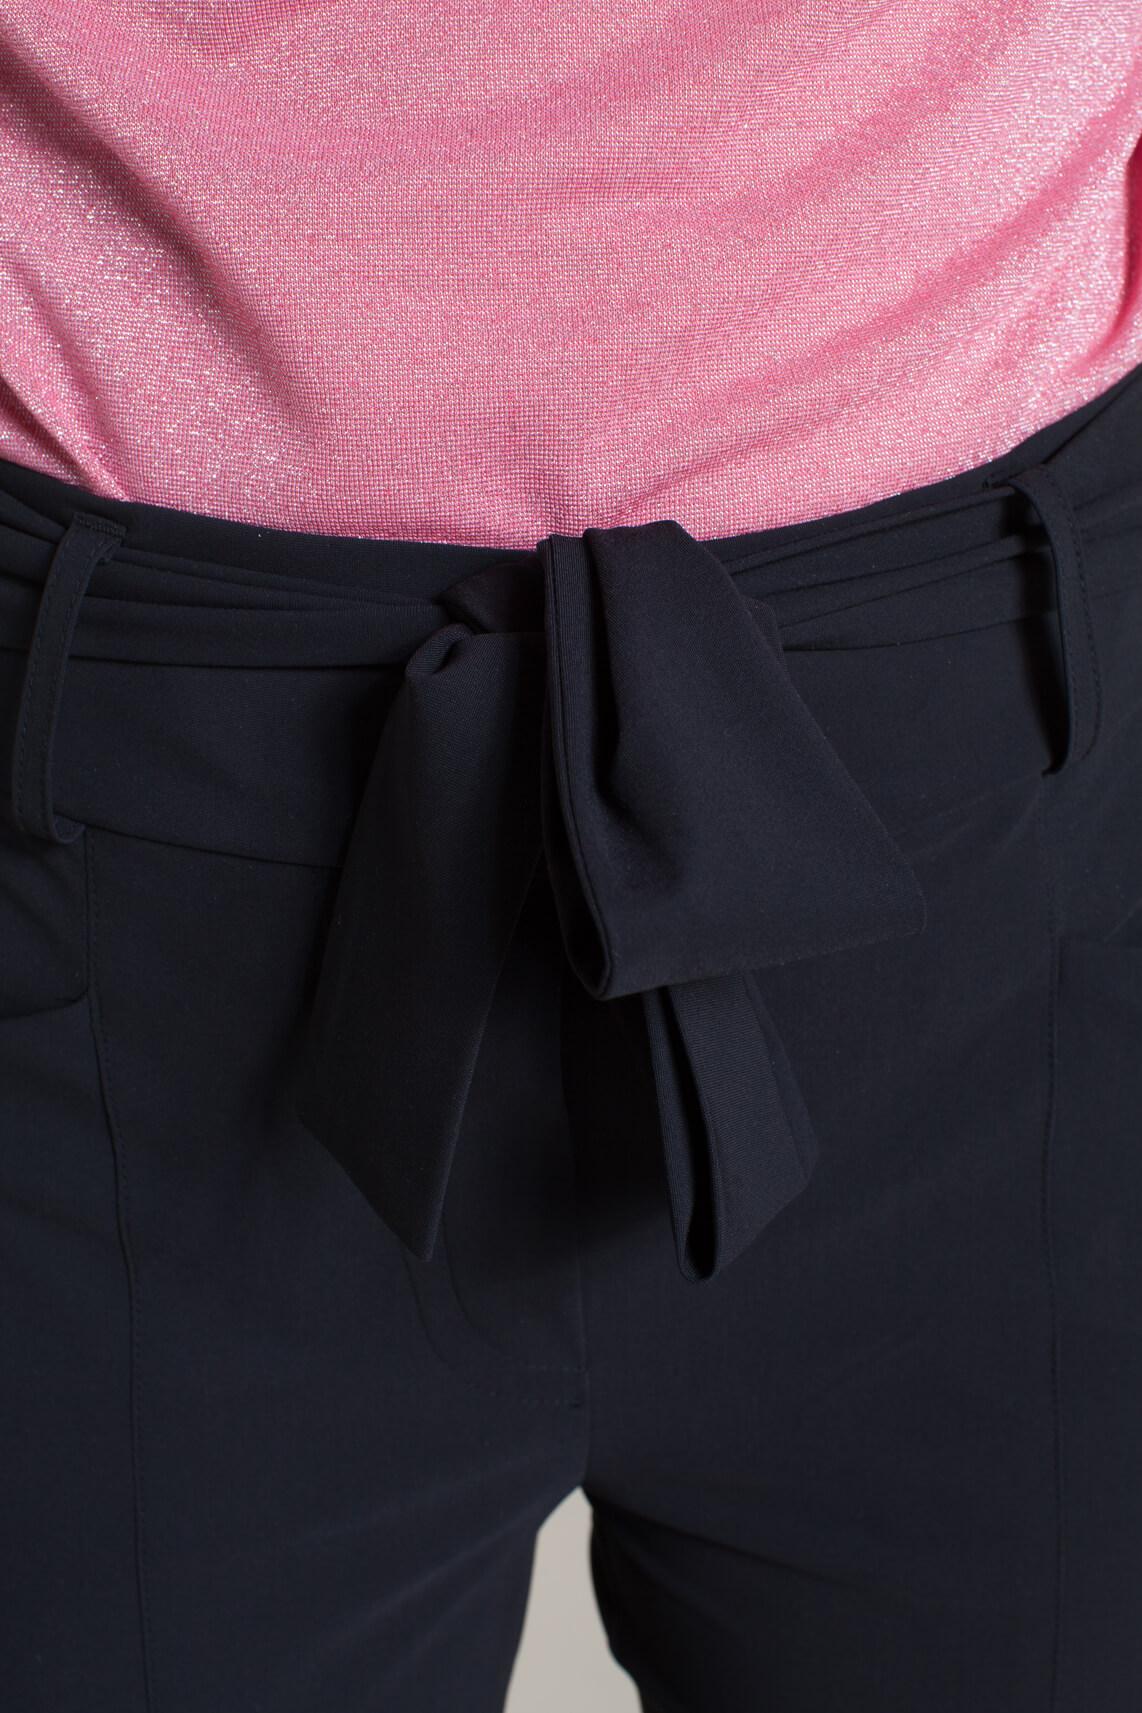 Jane Lushka Dames Vera broek met strik zwart